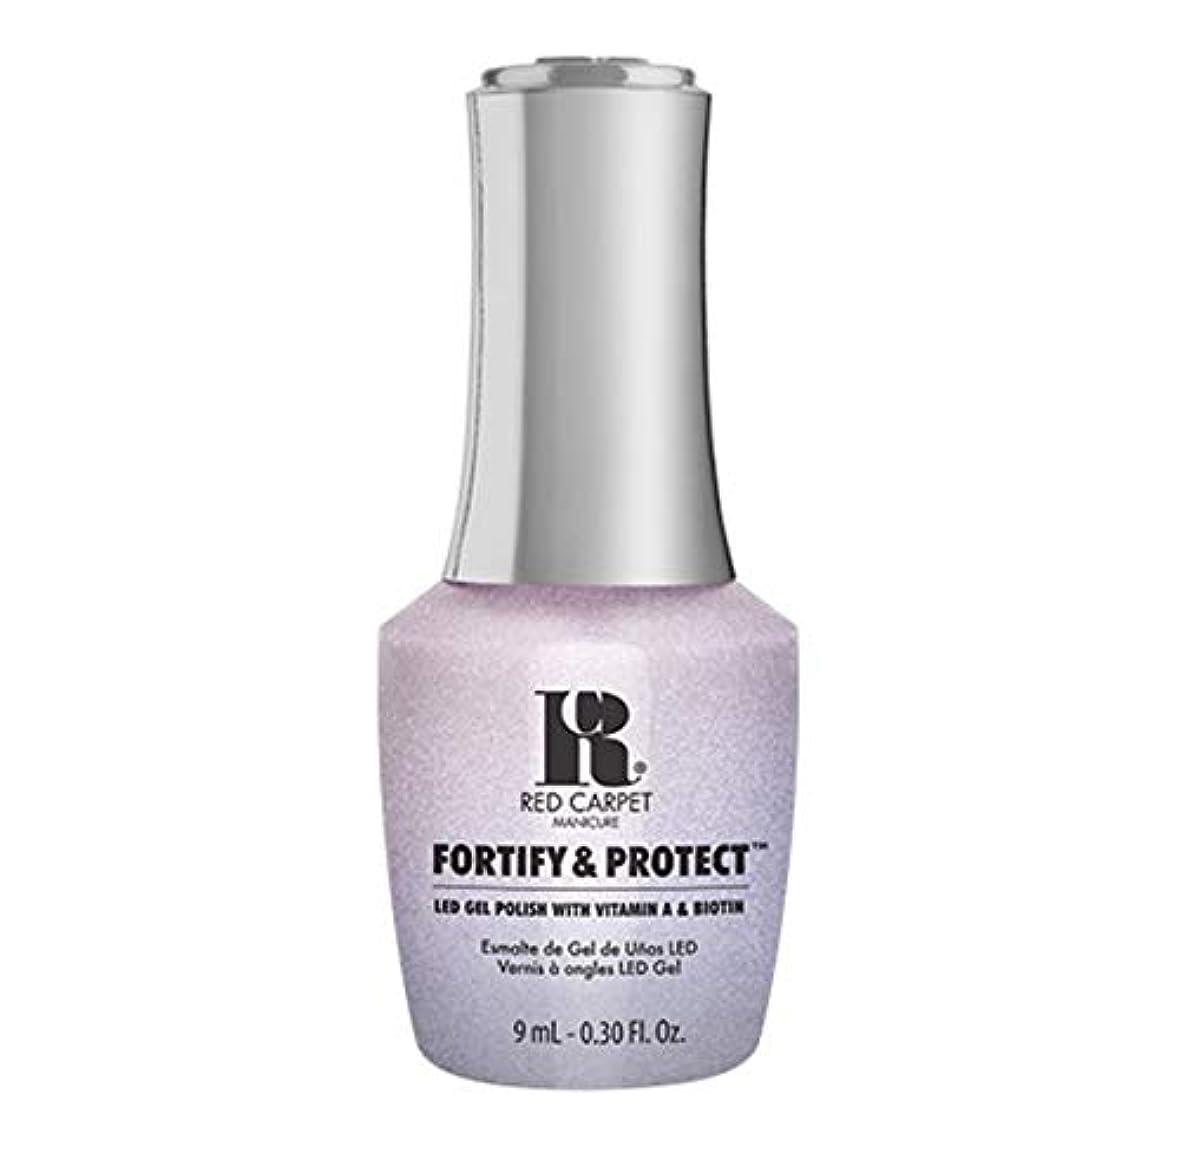 記念碑的な大学生水族館Red Carpet Manicure - Fortify & Protect - My Diamonds Sparkle - 9ml / 0.30oz